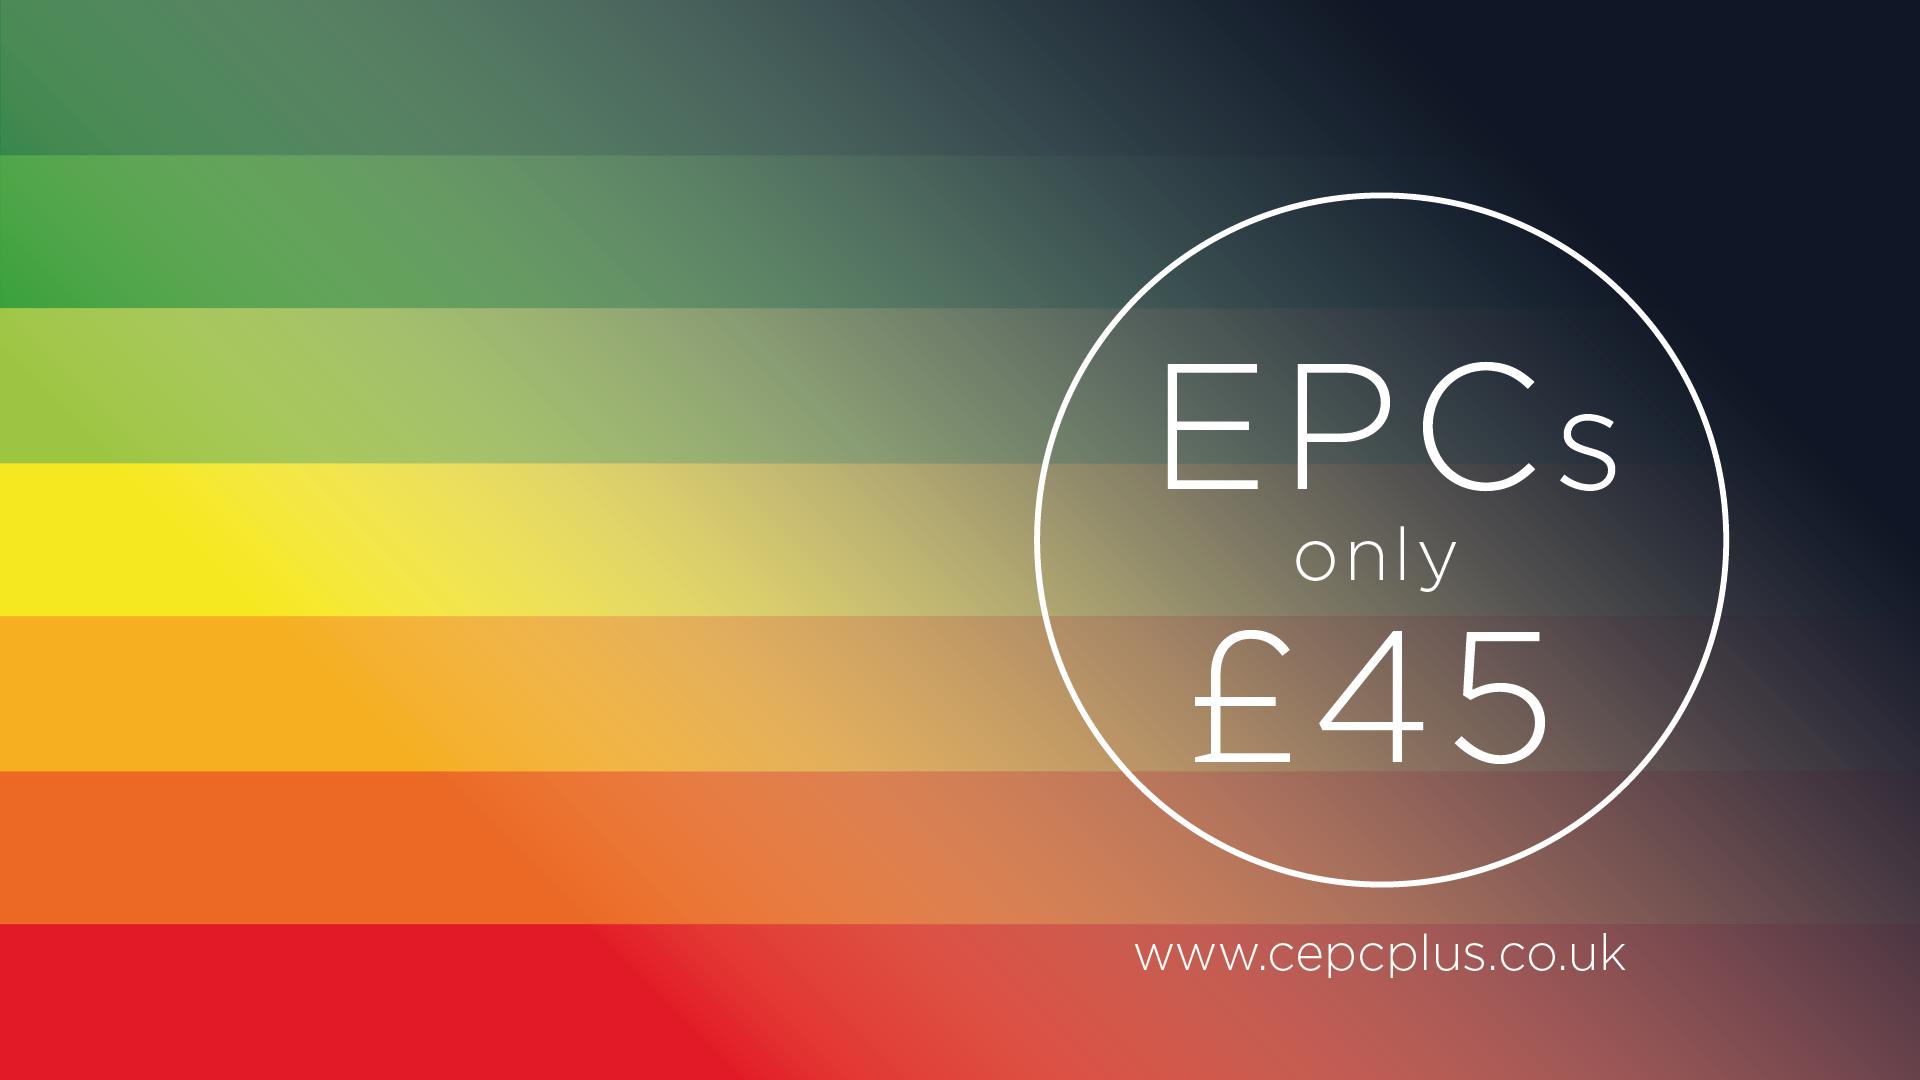 CEPCplus - Sunderland EPC